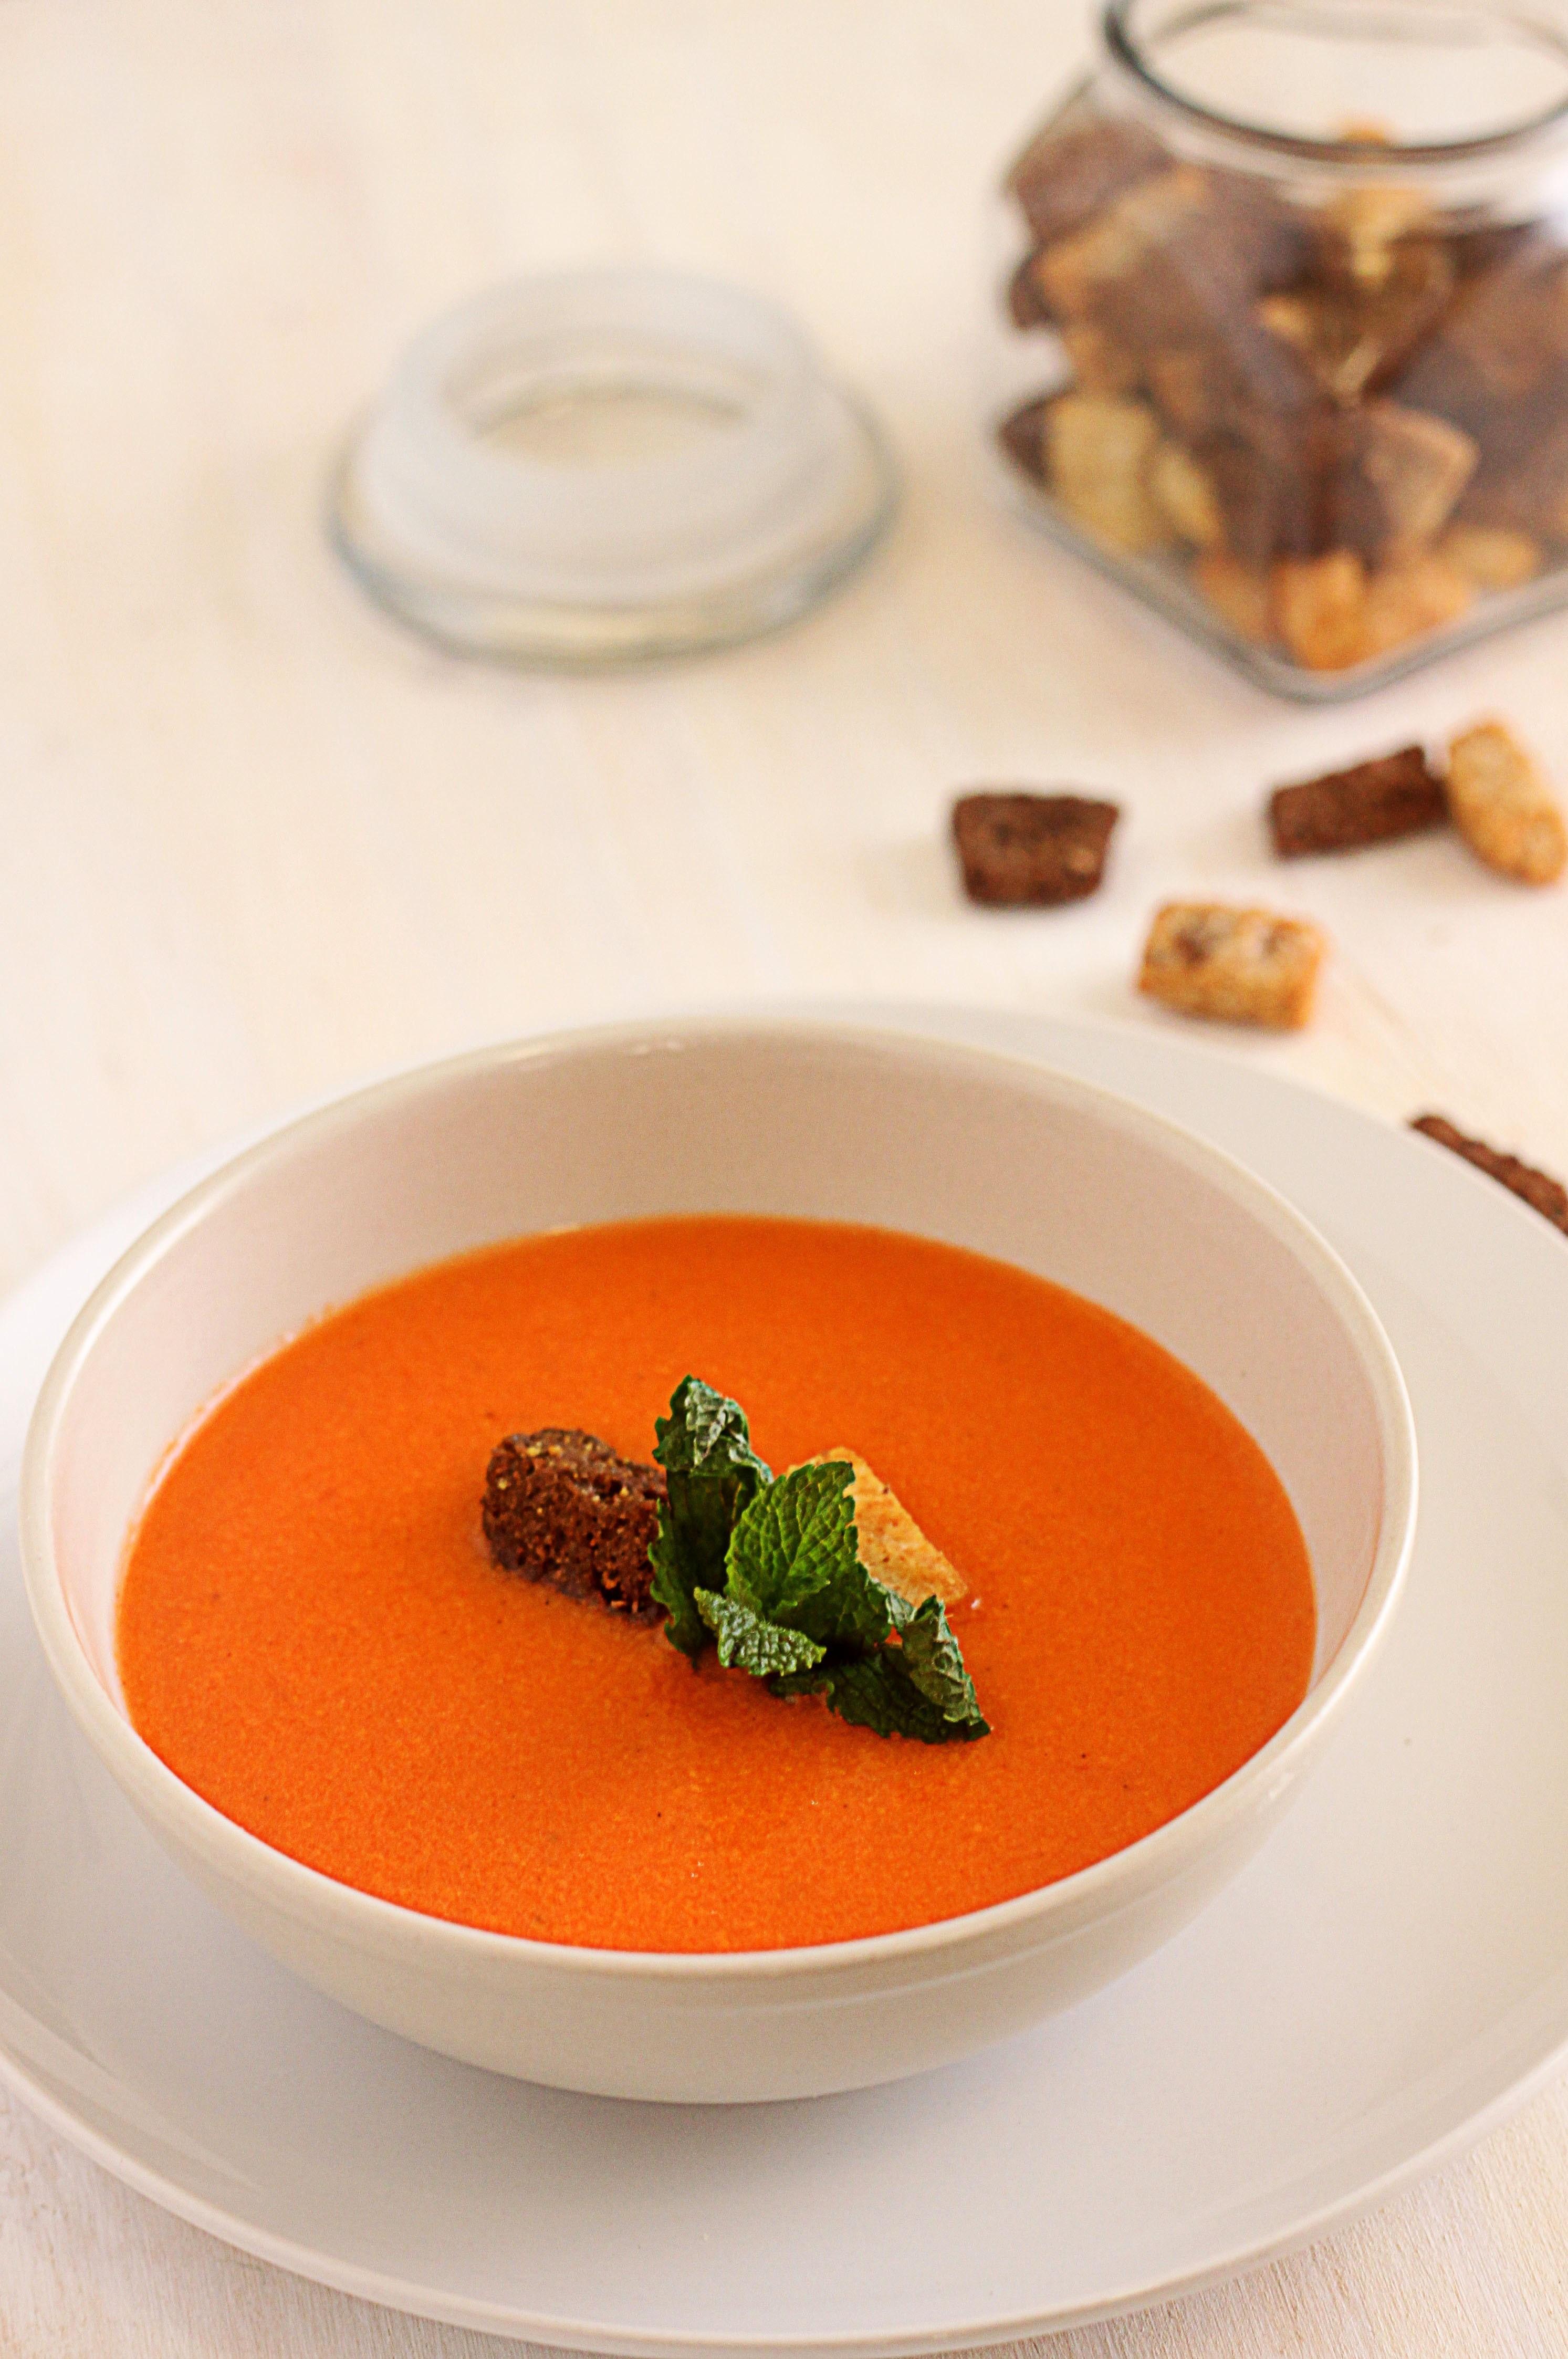 How To Make Tomato Soup  How To Make Cream of Tomato Soup Glorious Soup Recipes